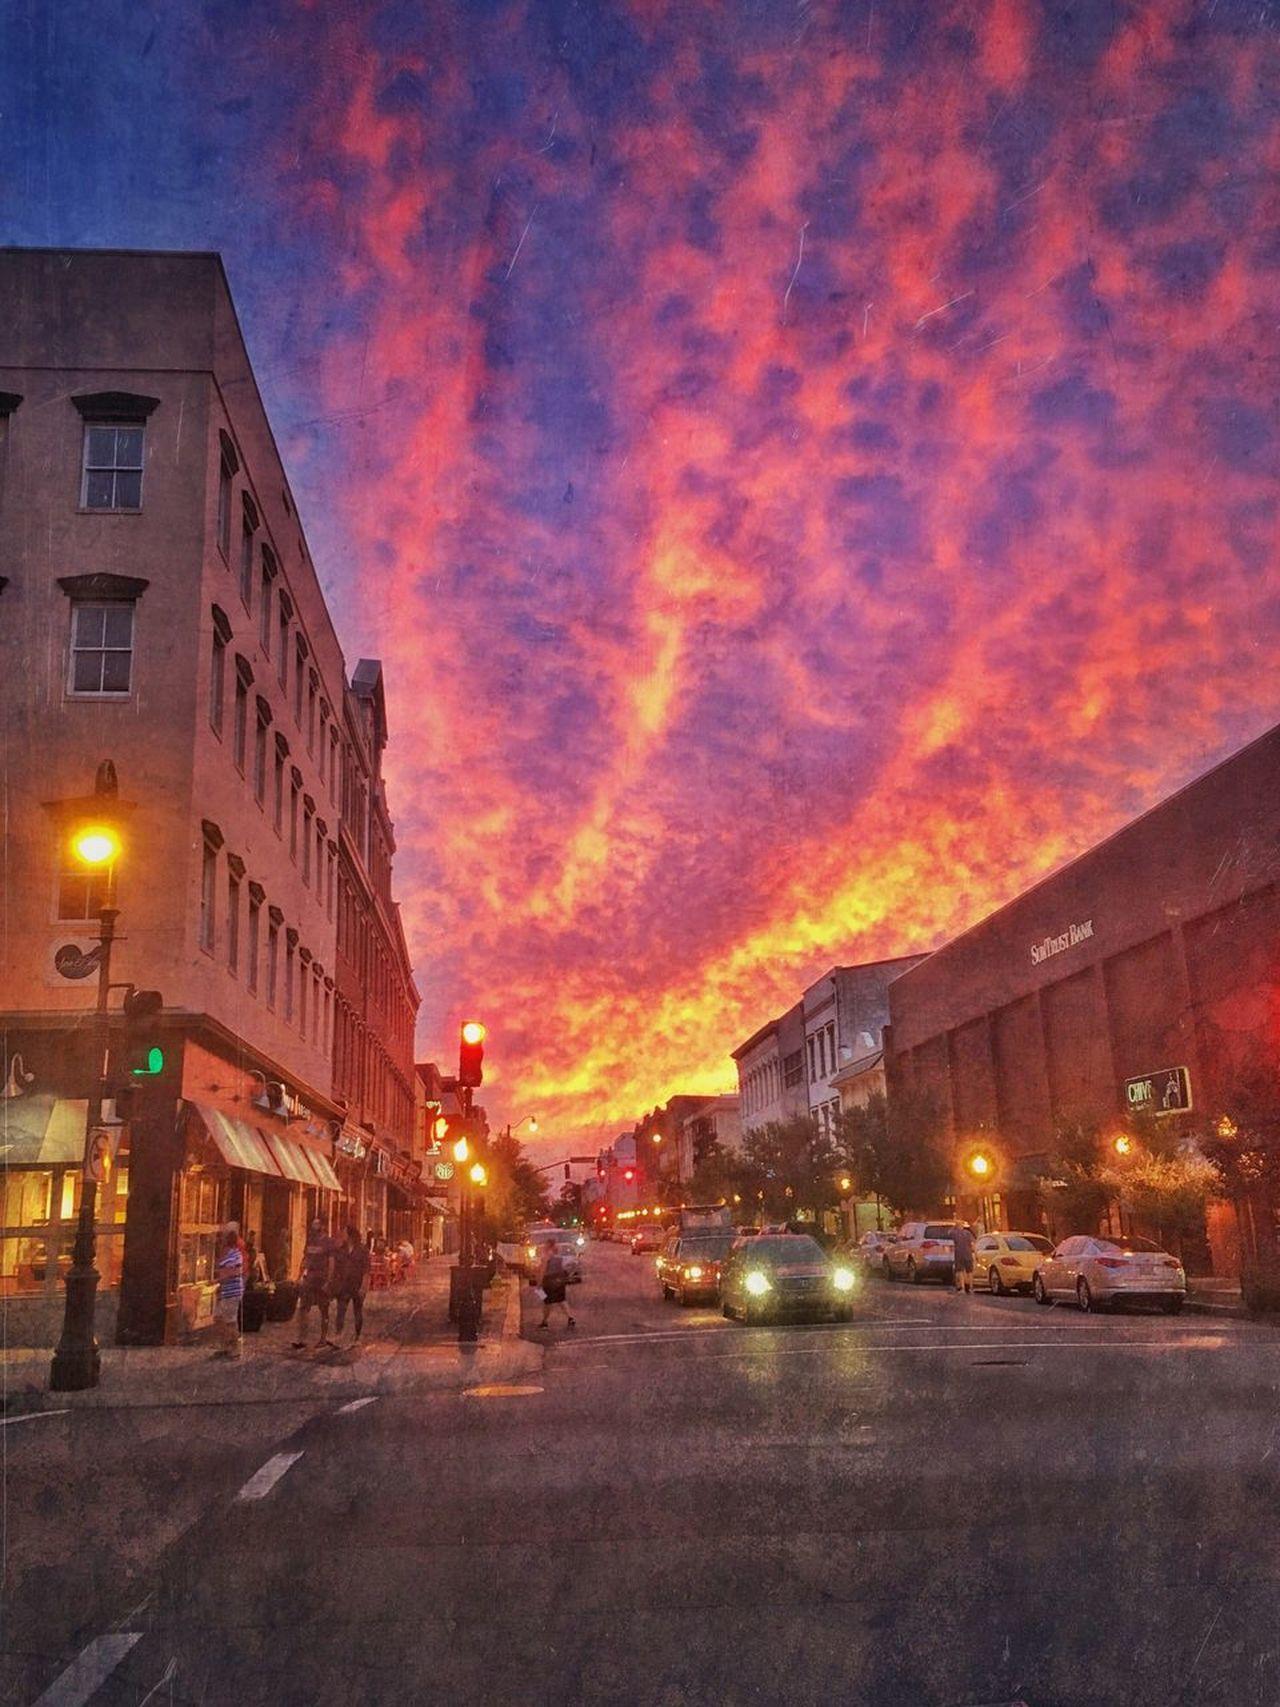 Savannah Nightlife